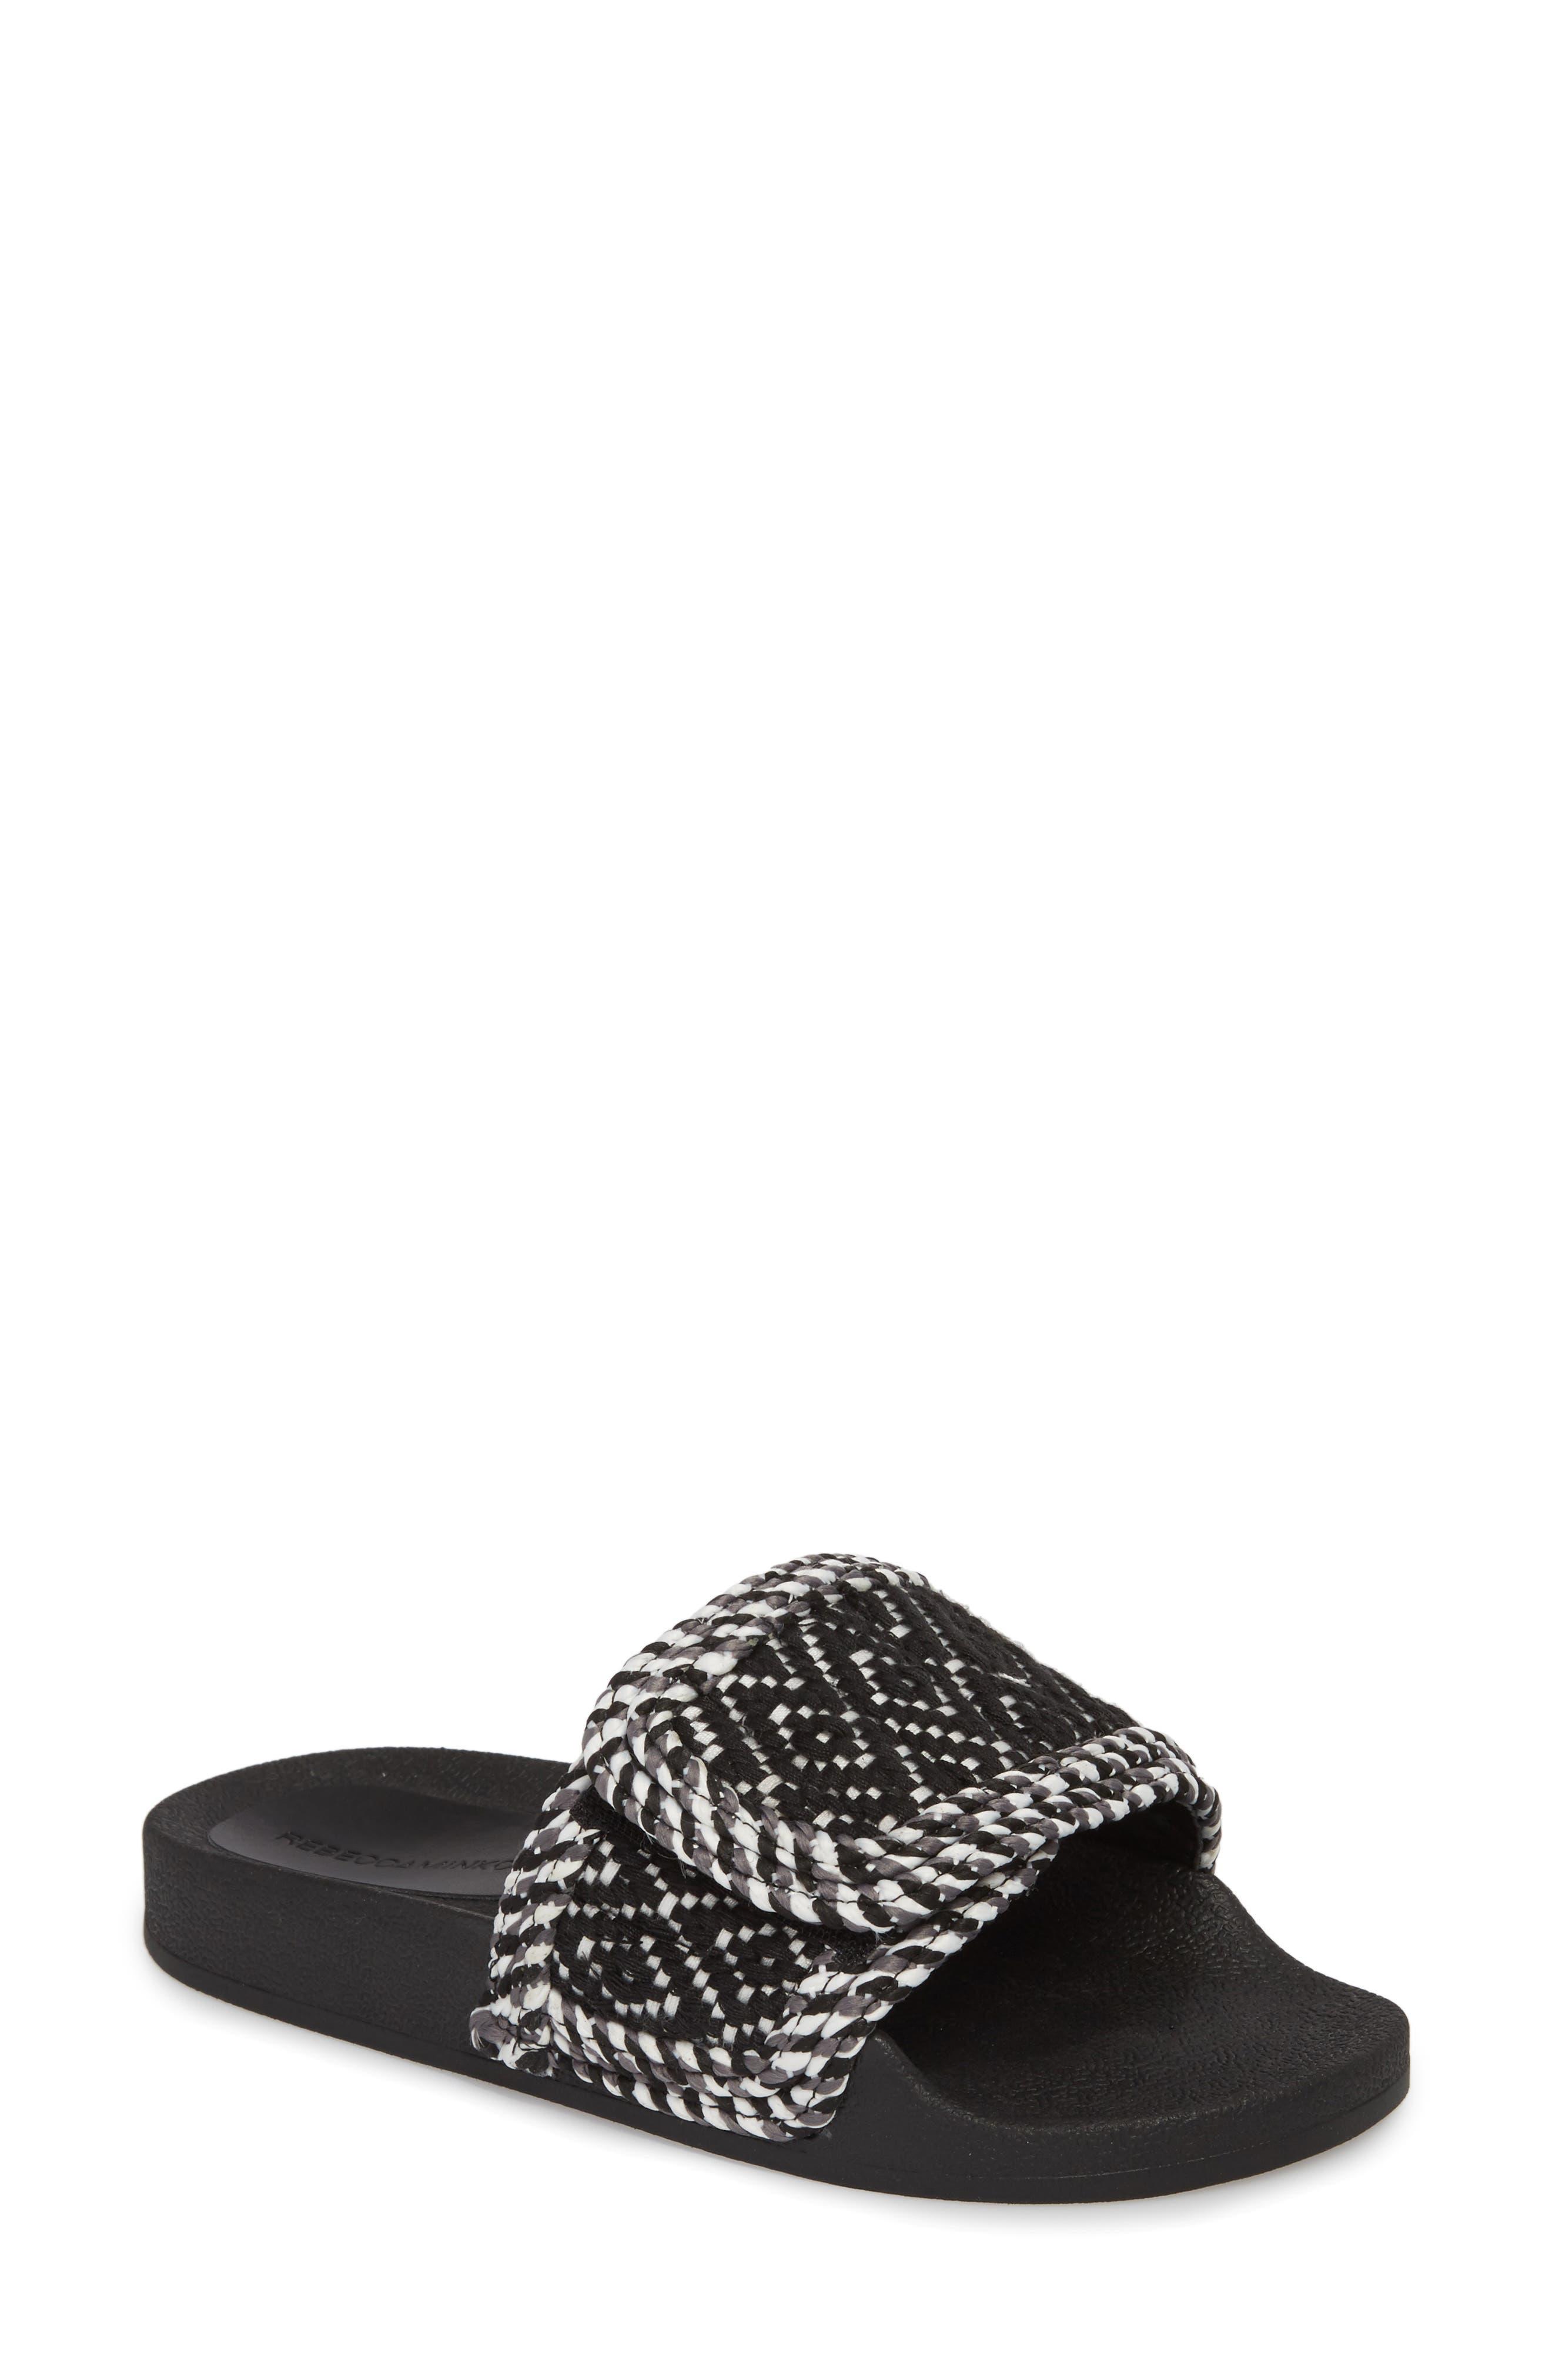 Tressa Woven Slide Sandal,                             Main thumbnail 1, color,                             Black/ White Woven Fabric